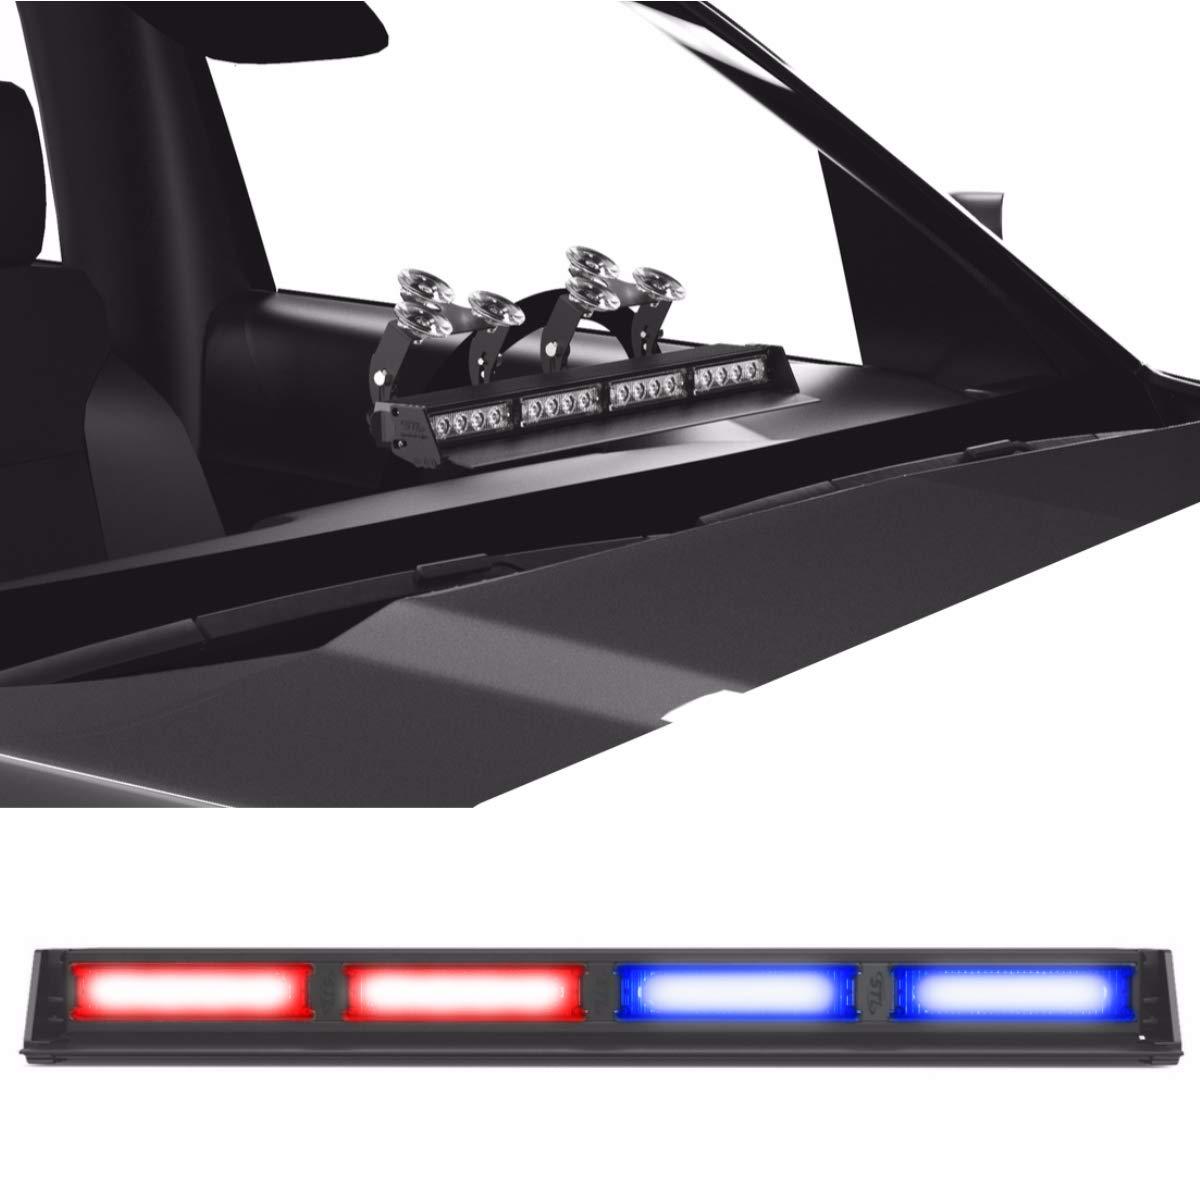 Striker TIR 4 Head LED Dash Light for Emergency Vehicles/Warning Strobe Deck/Dash Light Windshield Mount - Red/Blue